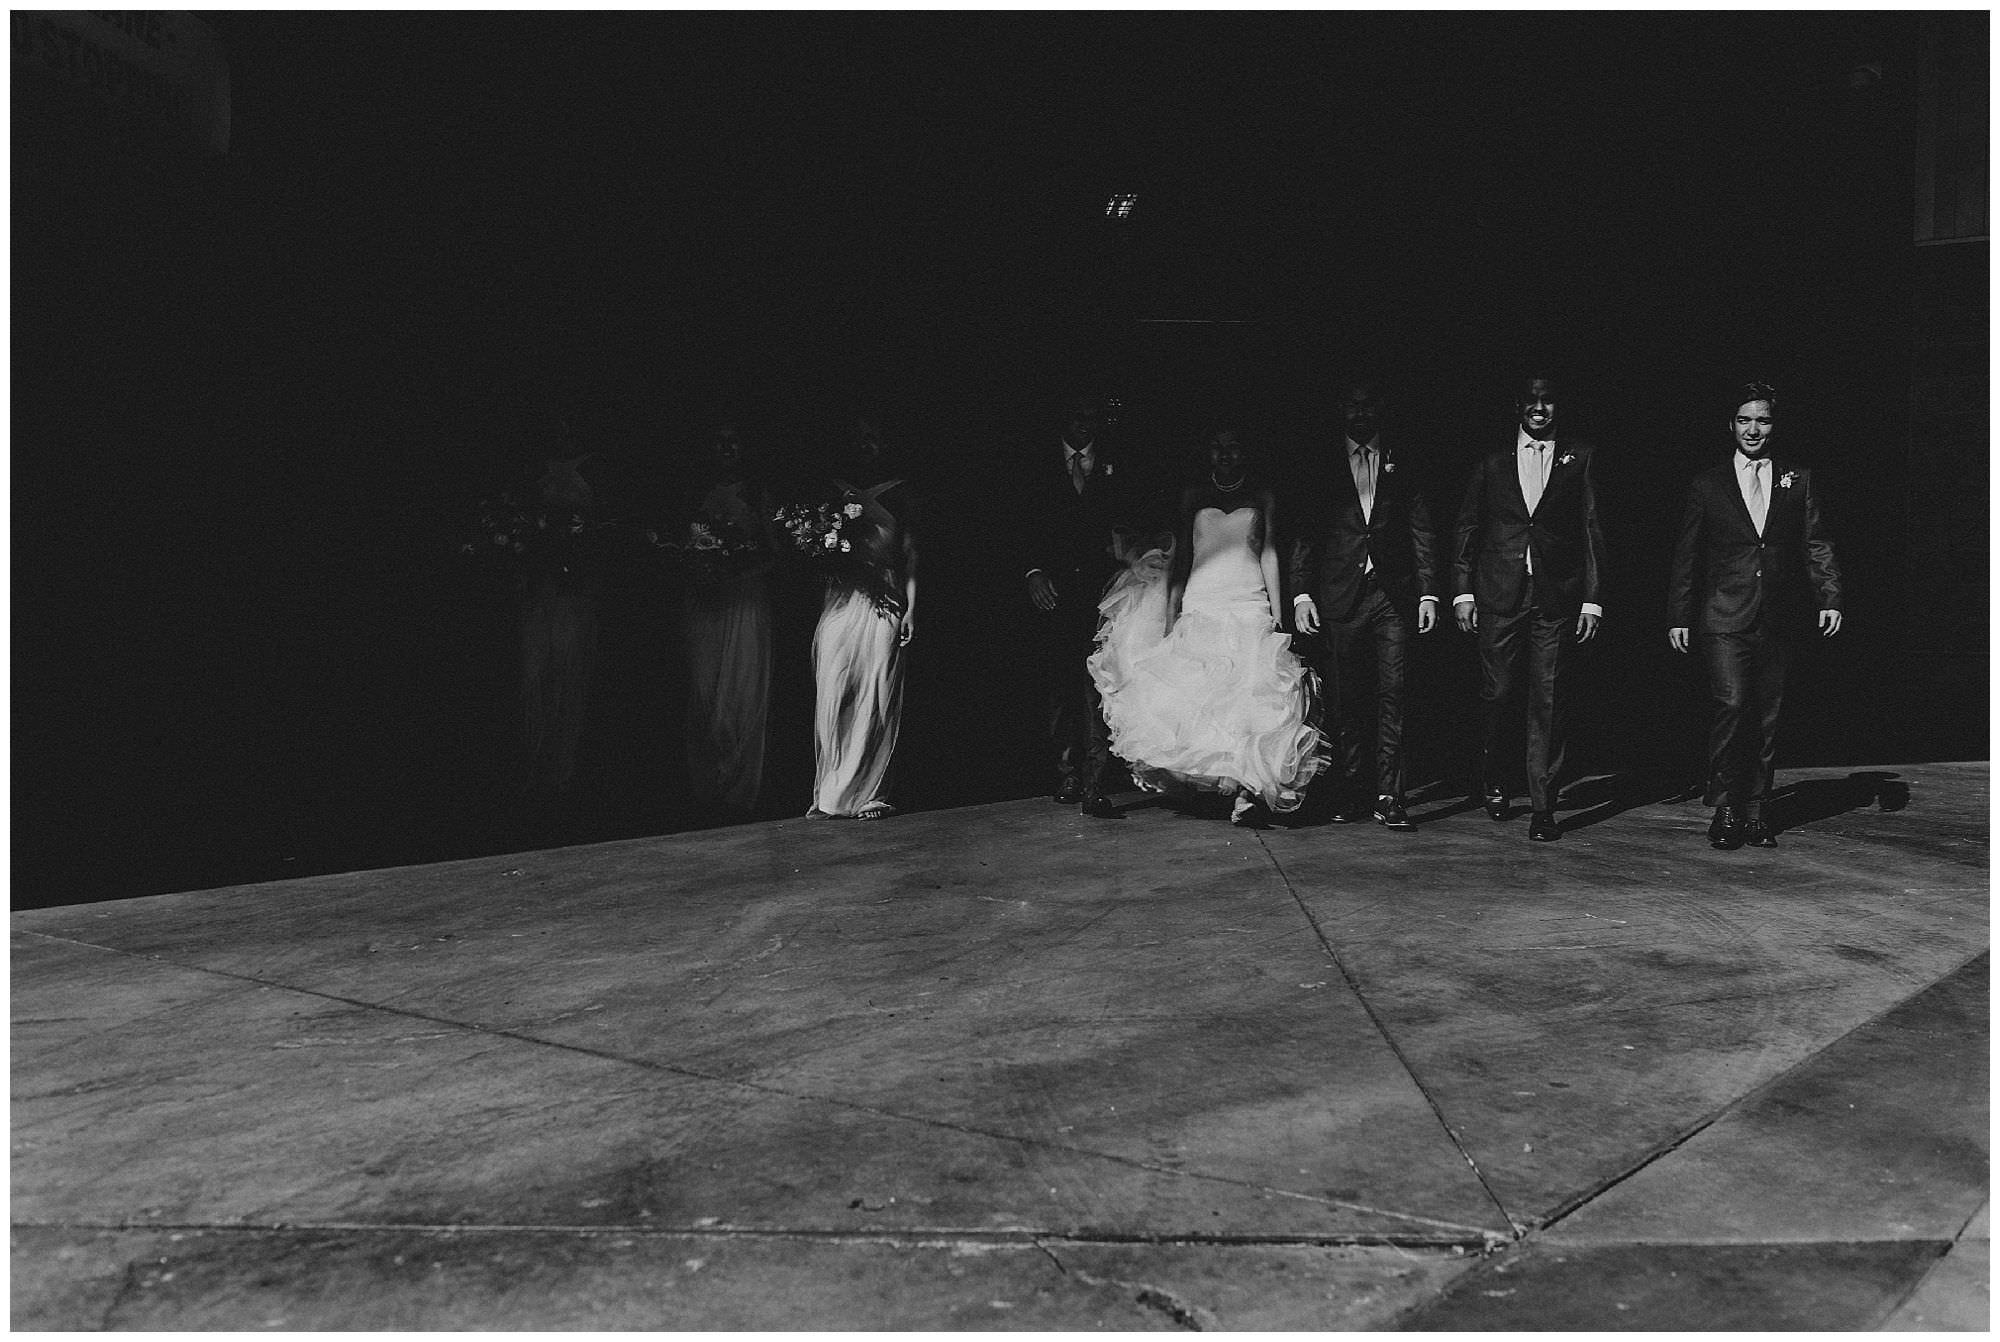 A badass Coal Harbour wedding by documentary wedding photographer Ronnie Lee Hill,